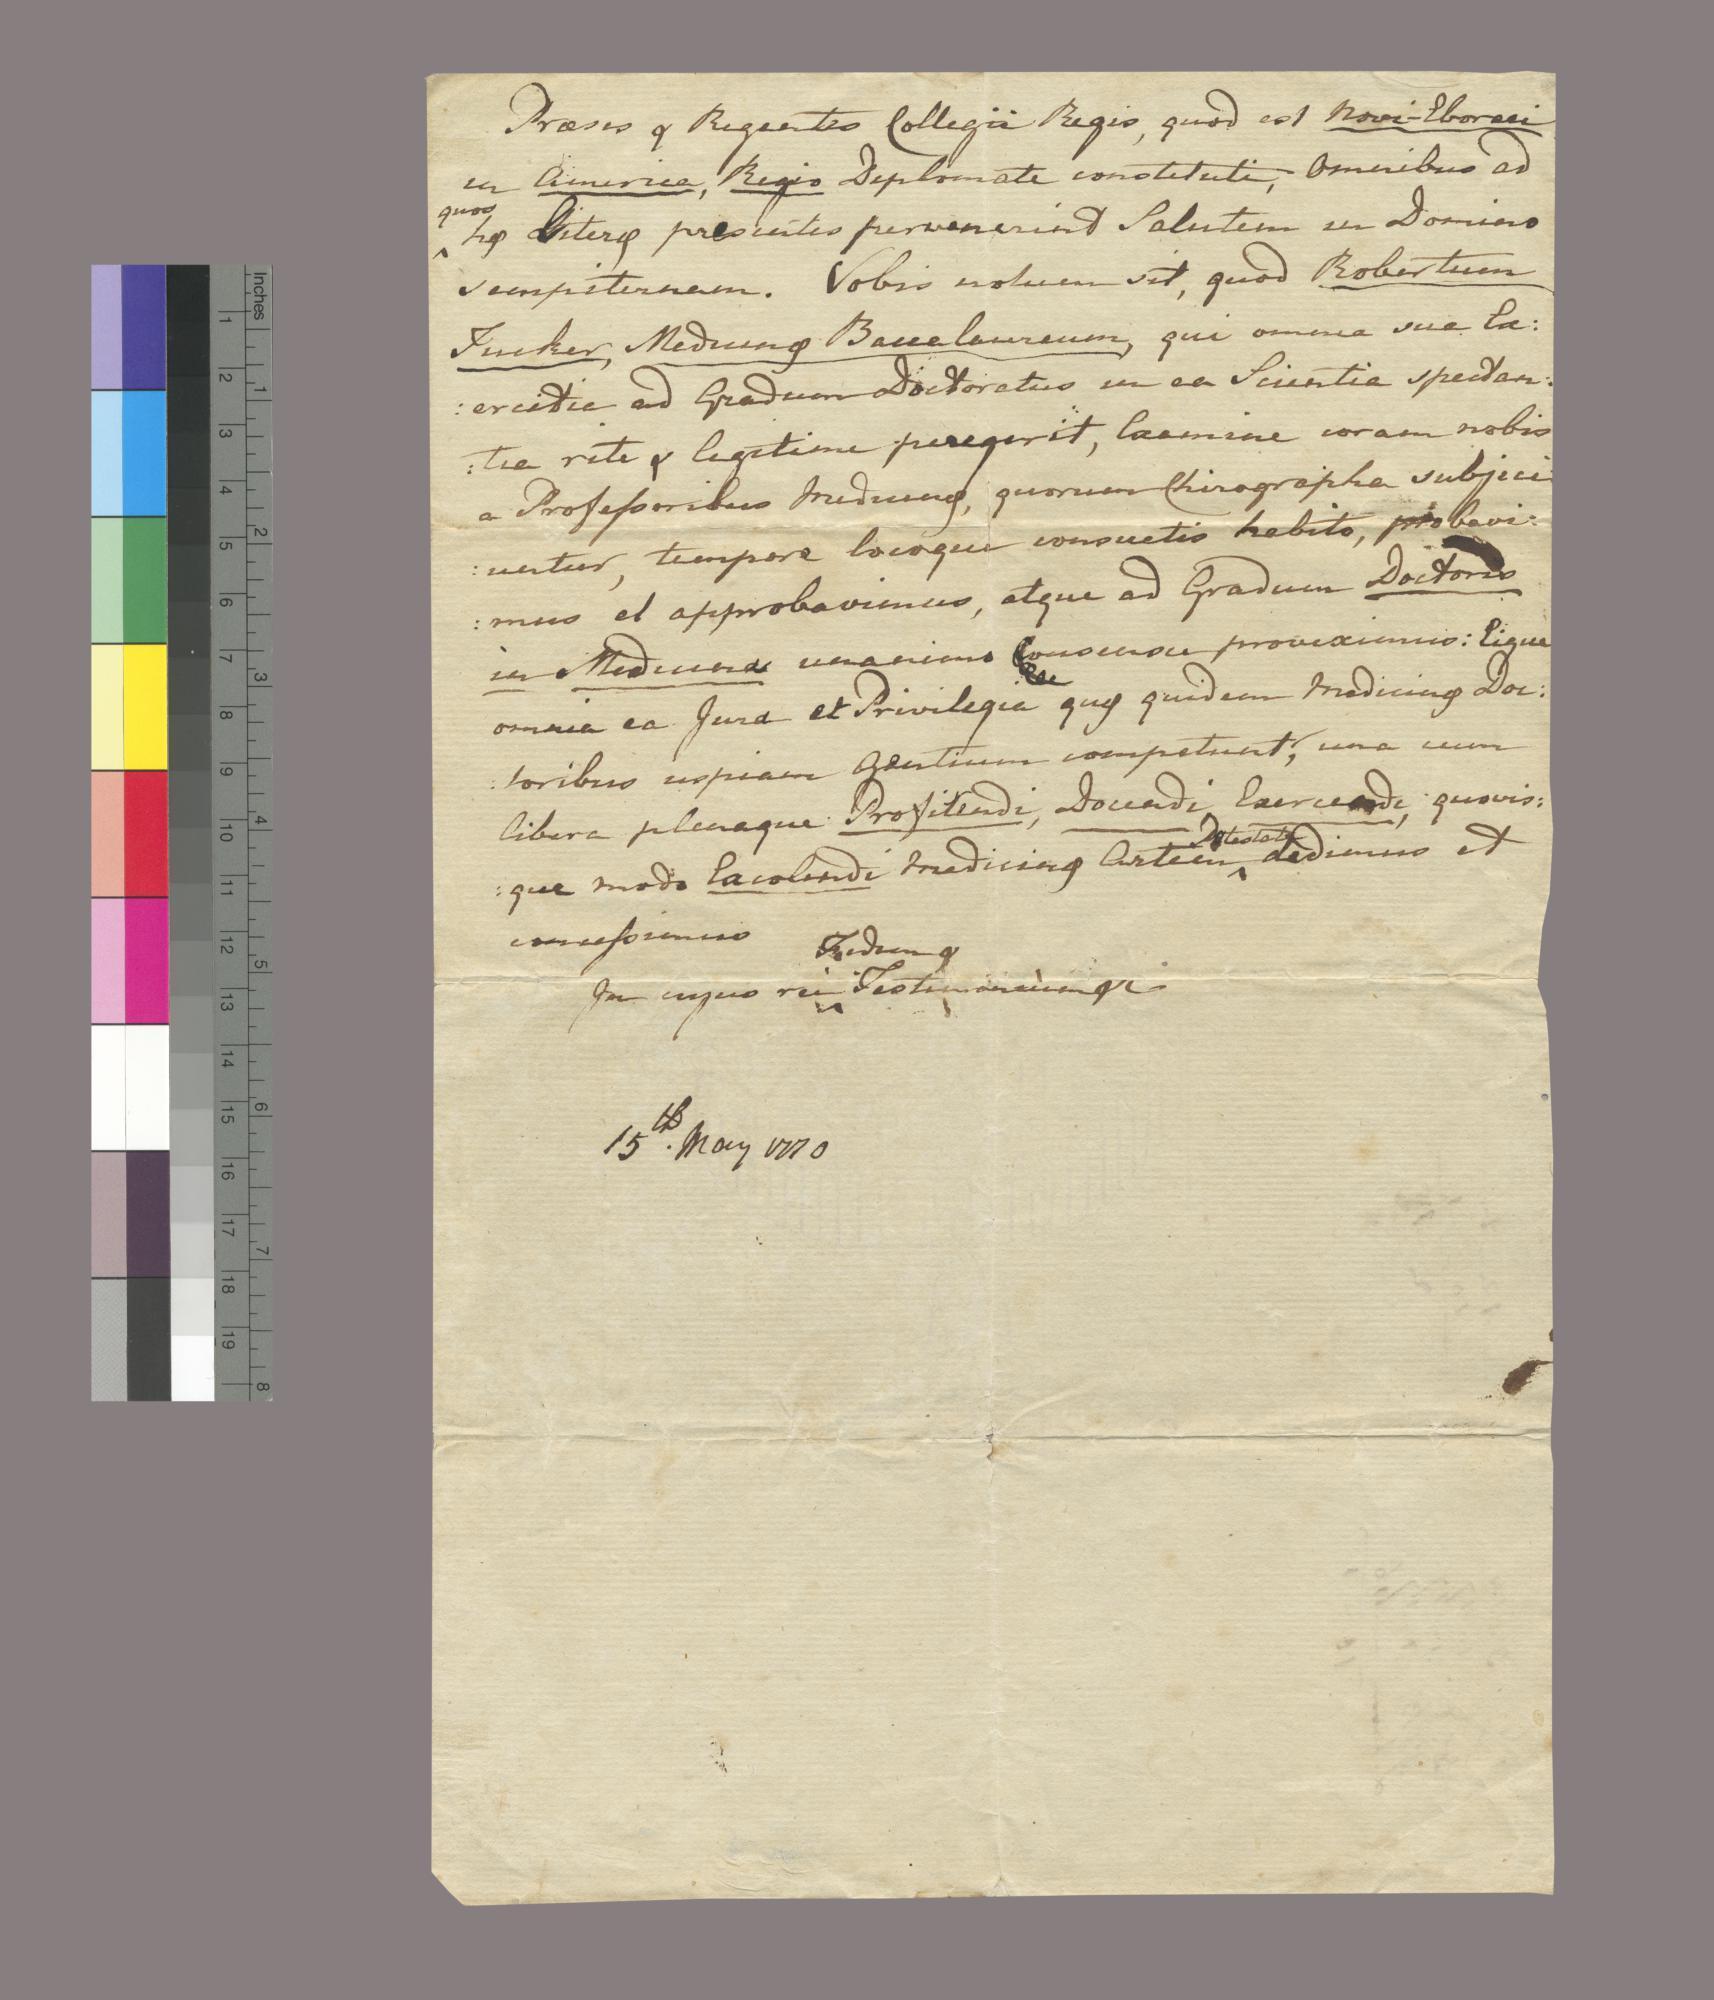 Draft of medical diploma of Robert Tucker